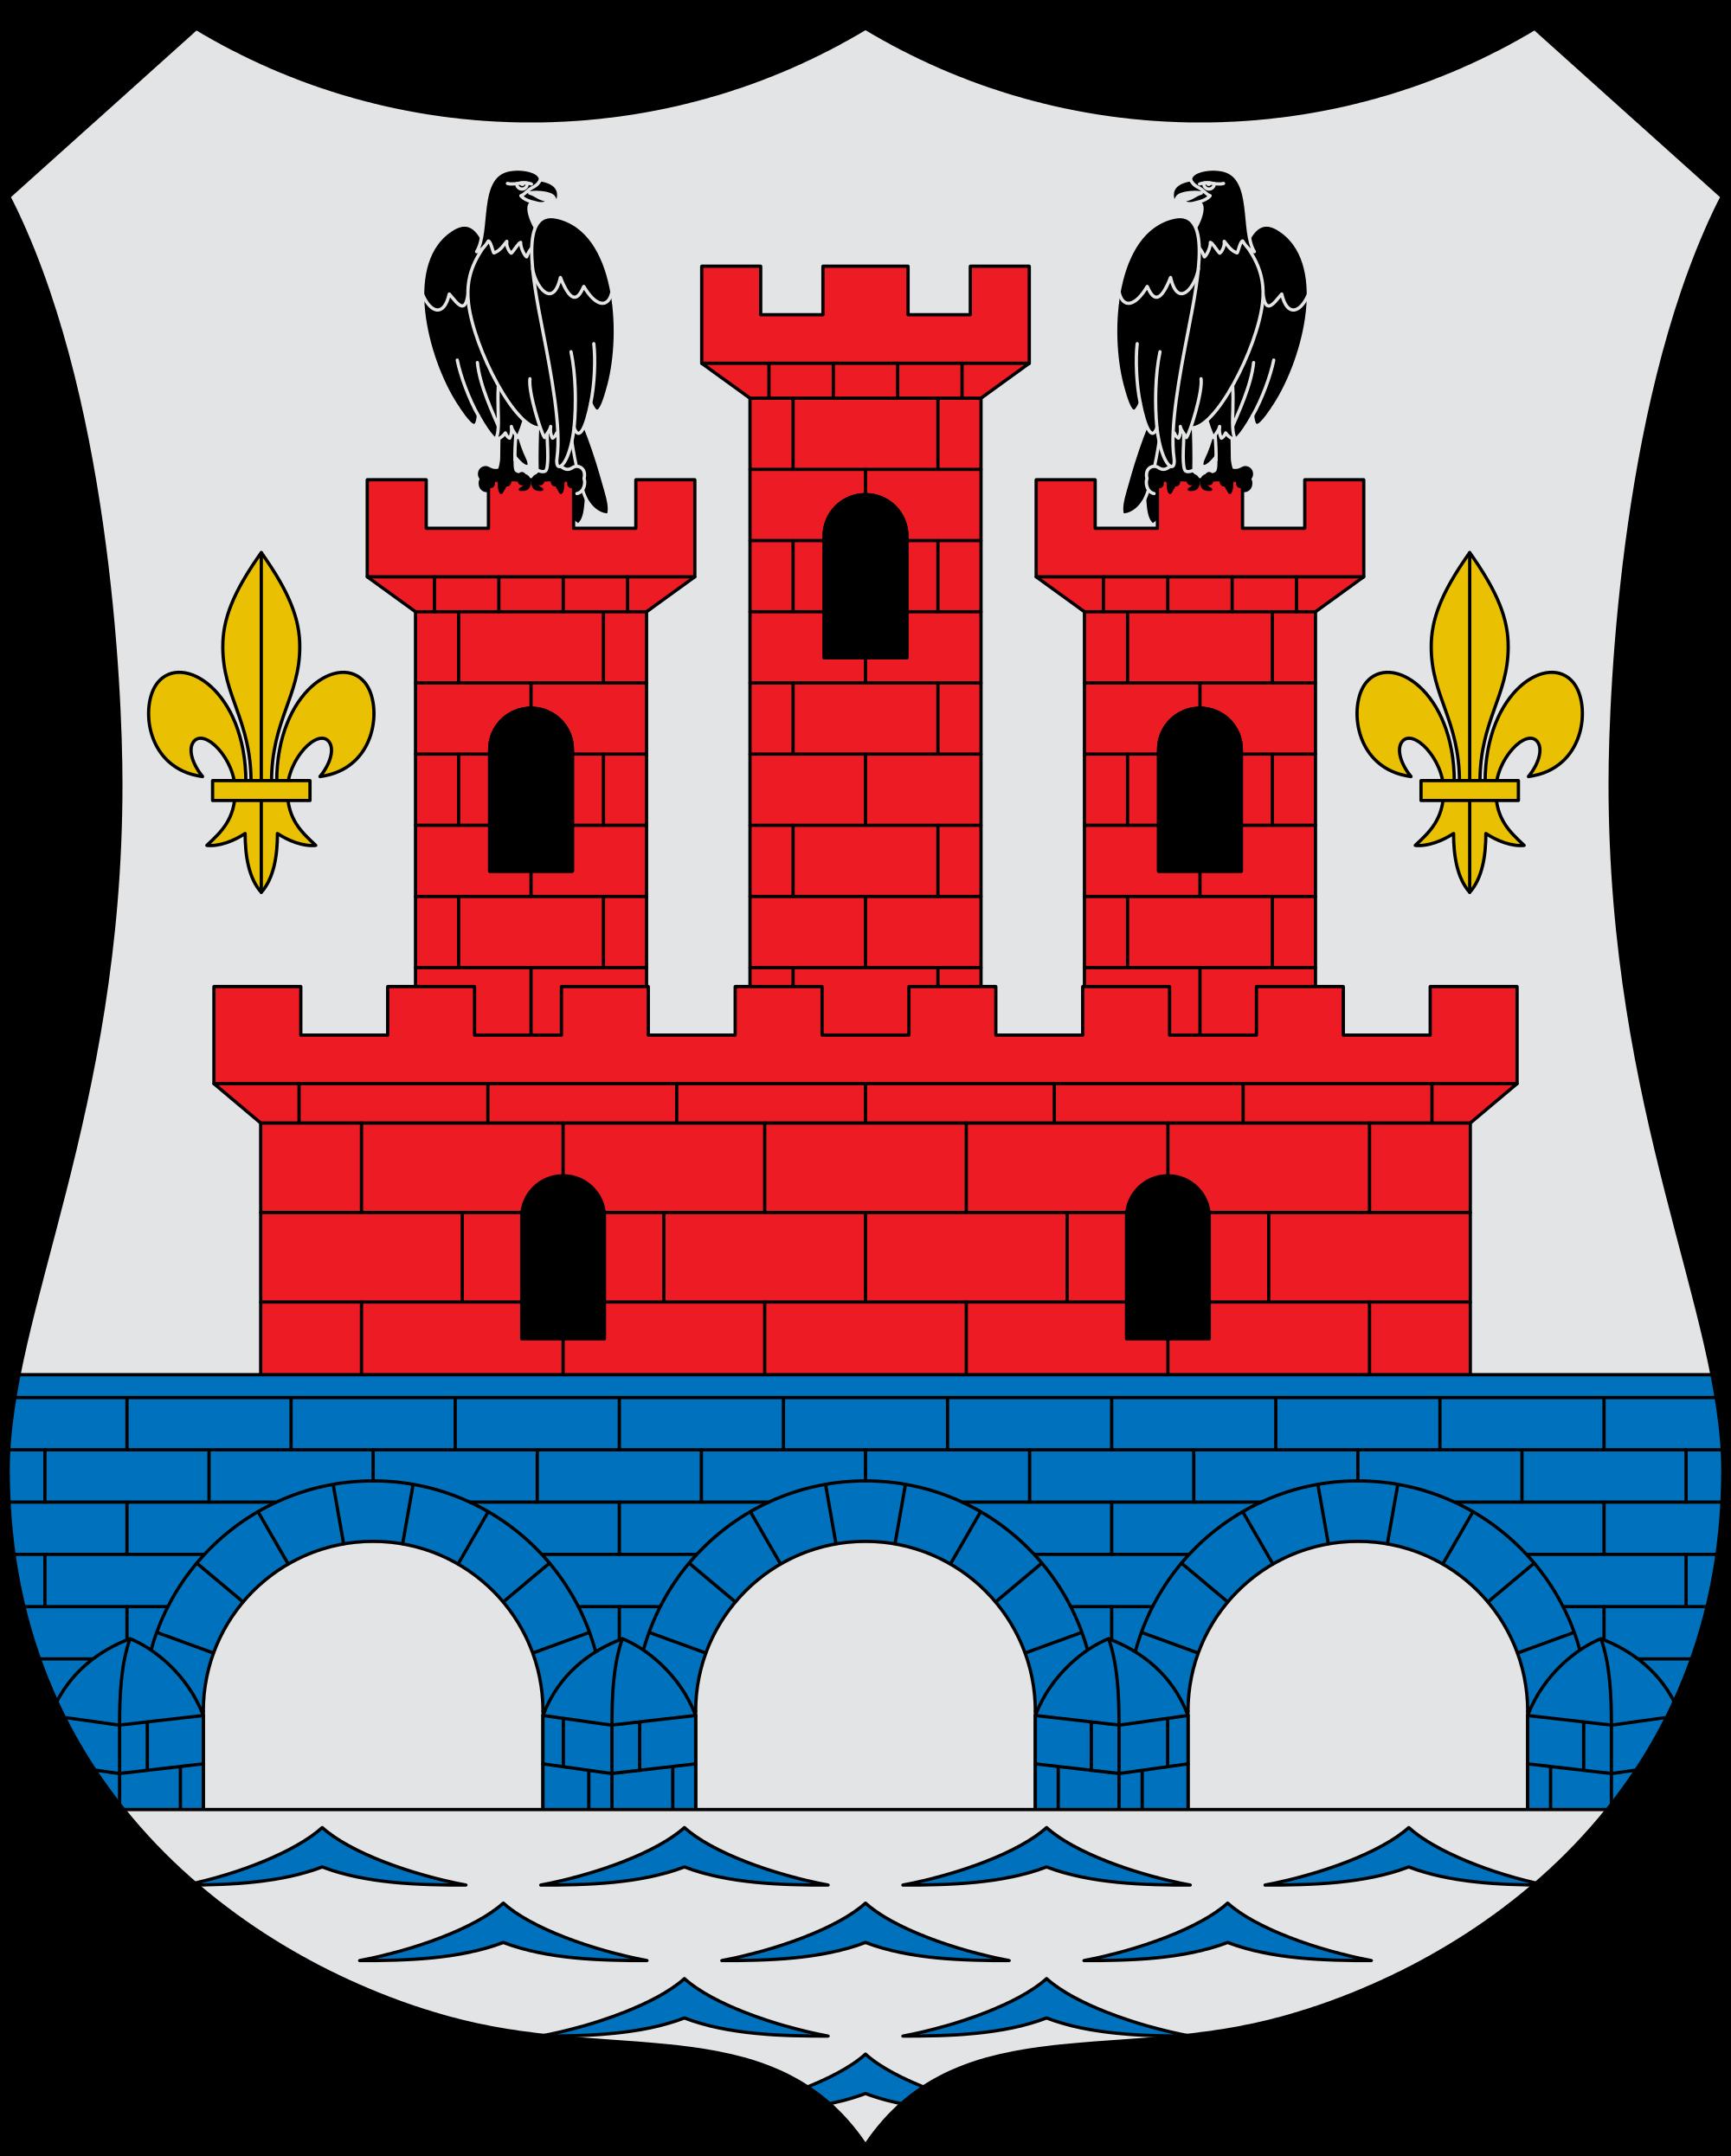 File:Escudo de Palenzuela (Palencia).svg.